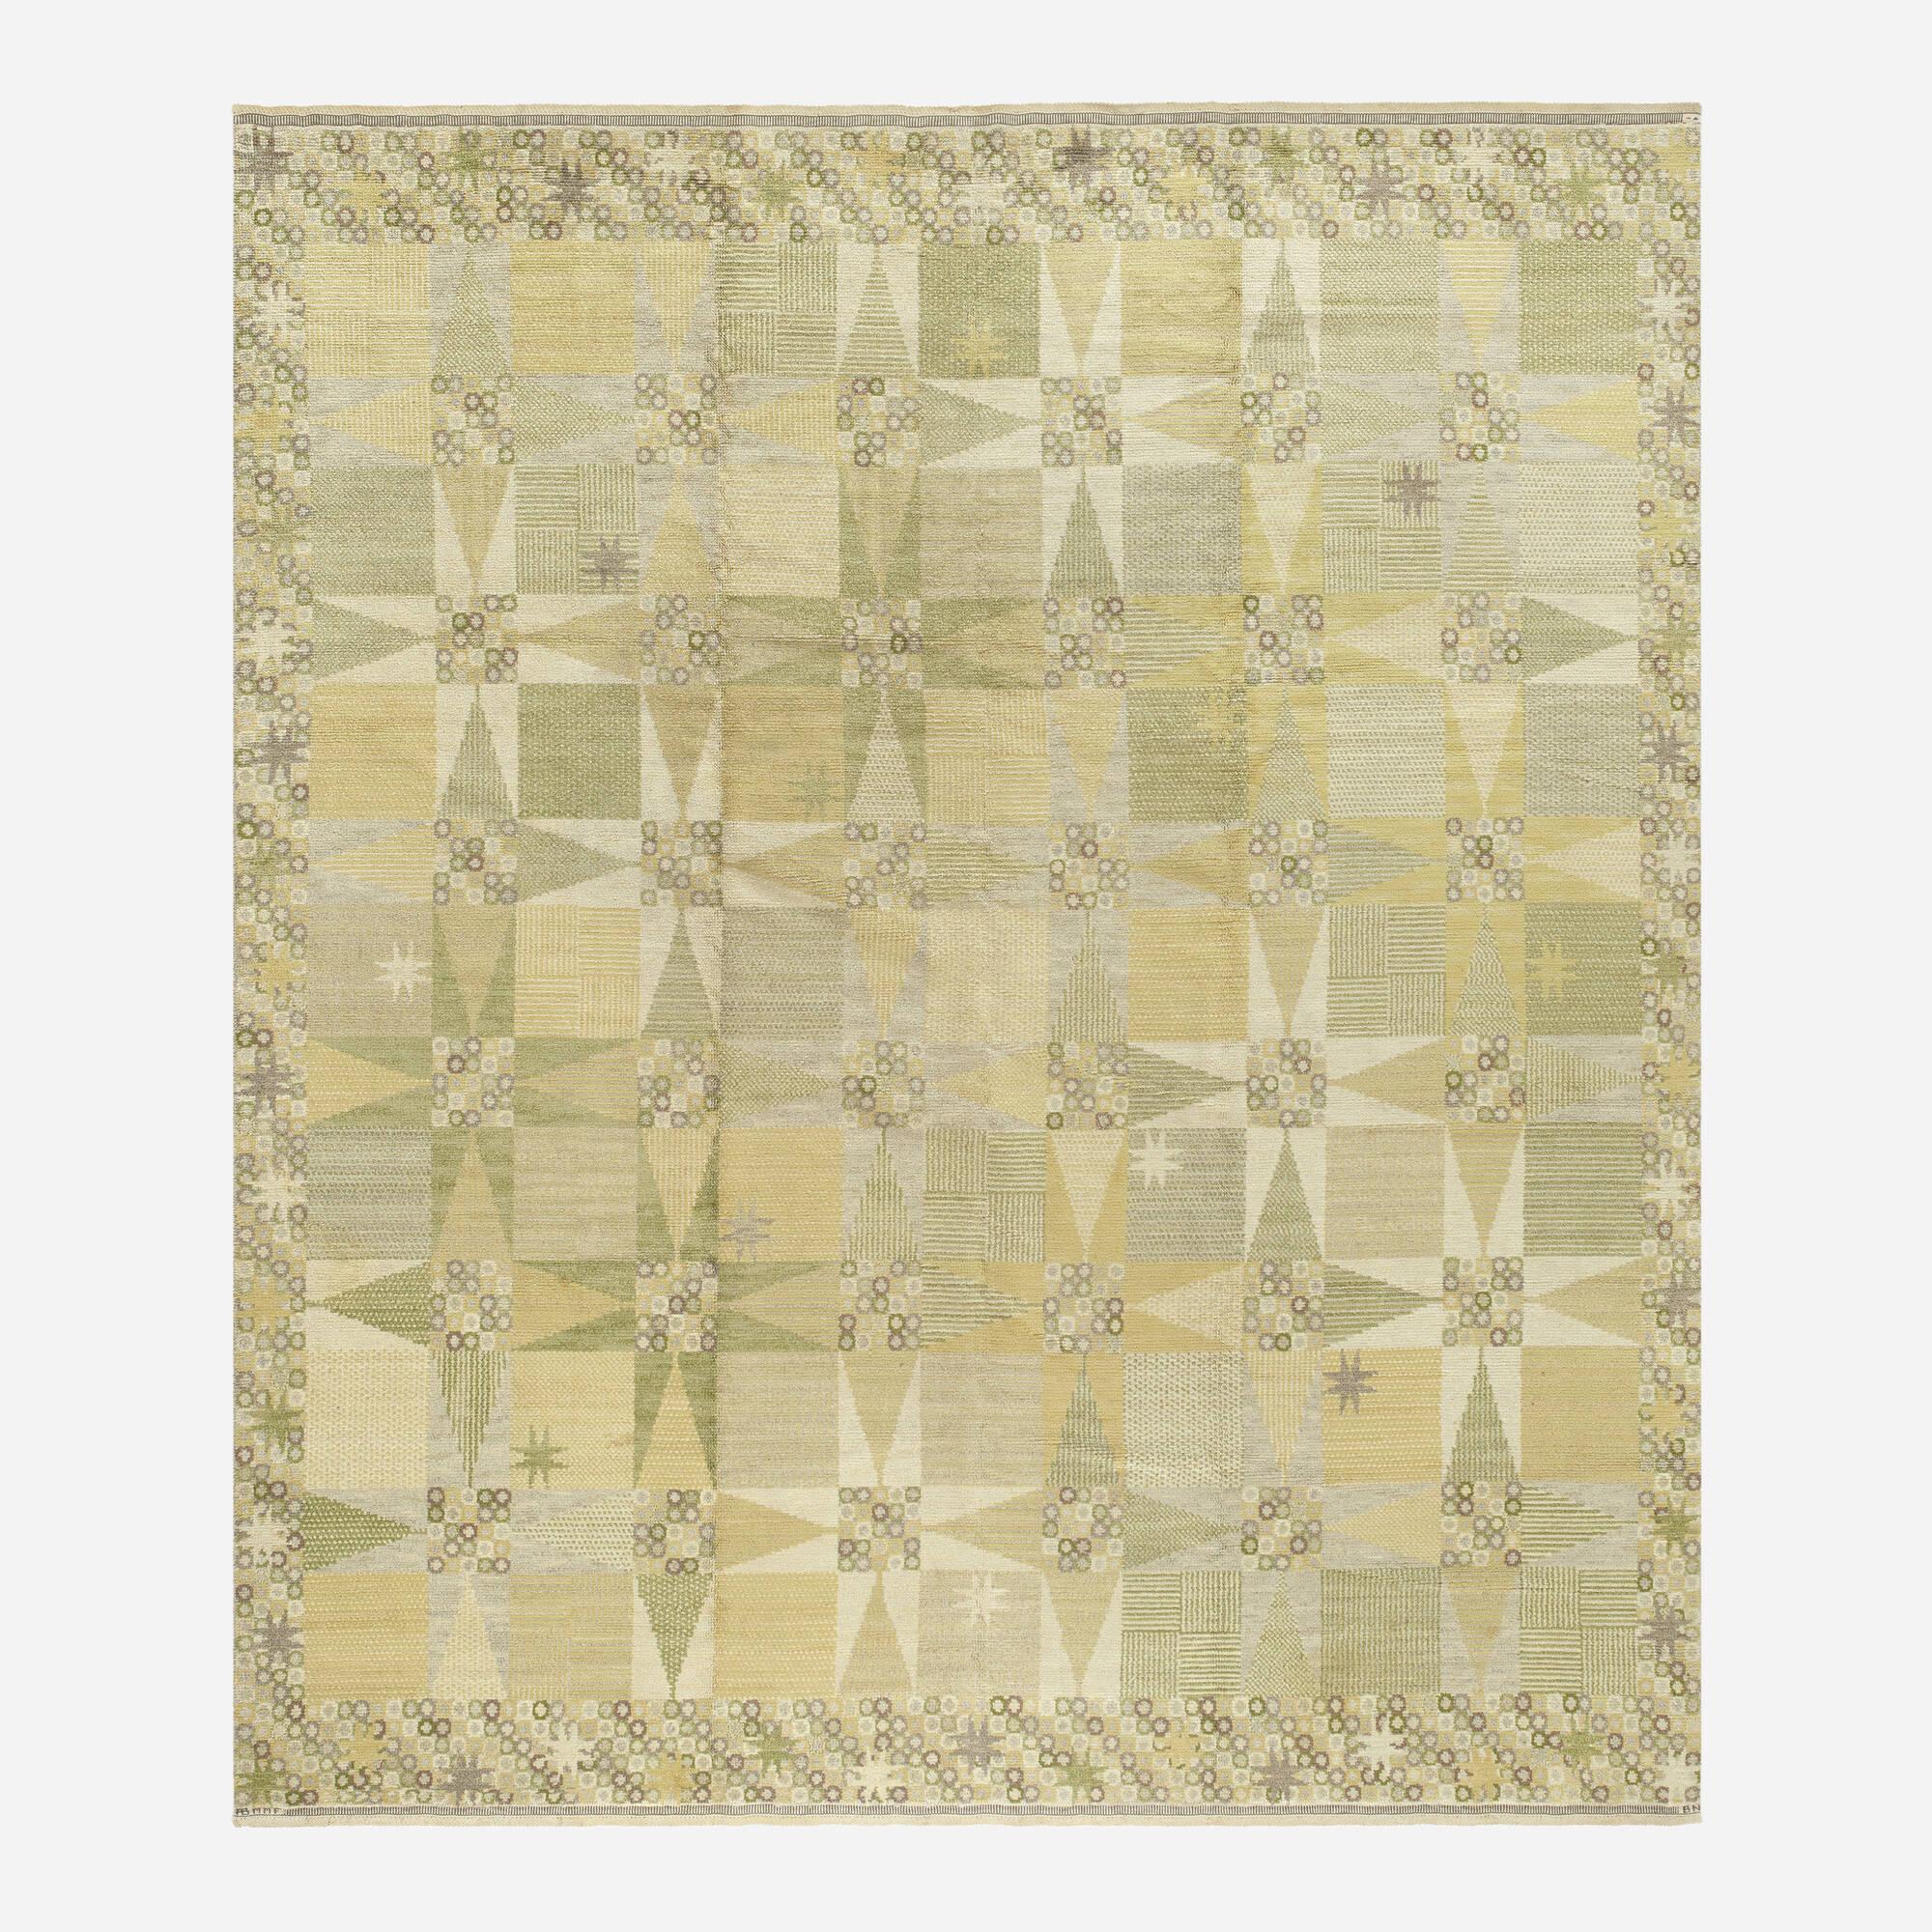 184: Barbro Nilsson / Stjärnflossan pile carpet (1 of 2)